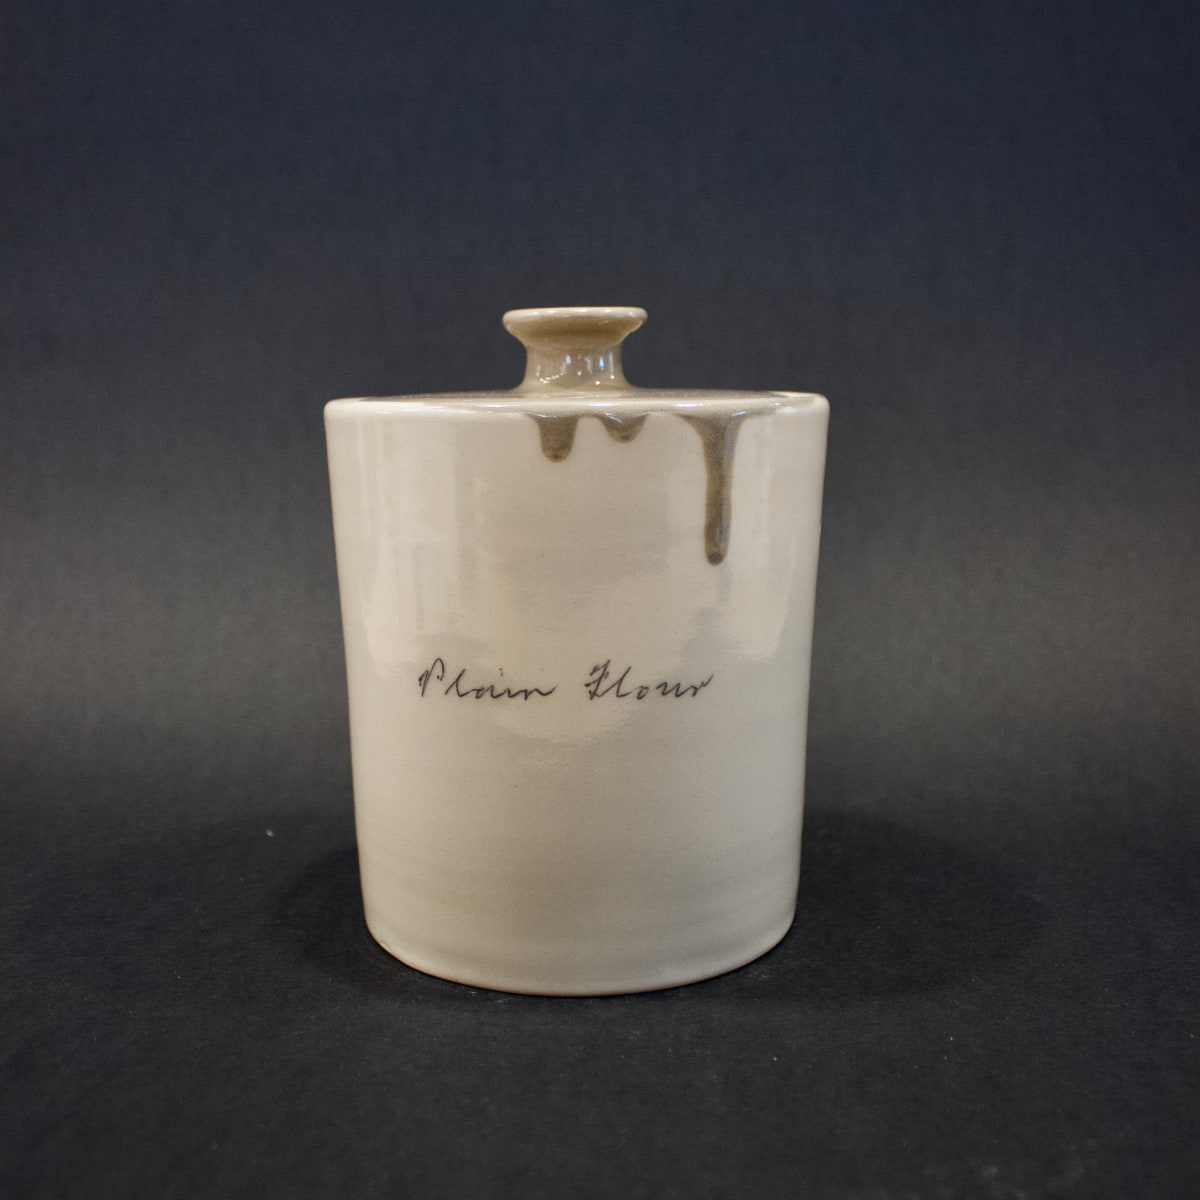 Alice Funge Plain Flour Jar Chocolate Brown, 2019 Stoneware 16 x 12 x 12 cm 6 1/4 x 4 3/4 x 4 3/4 in